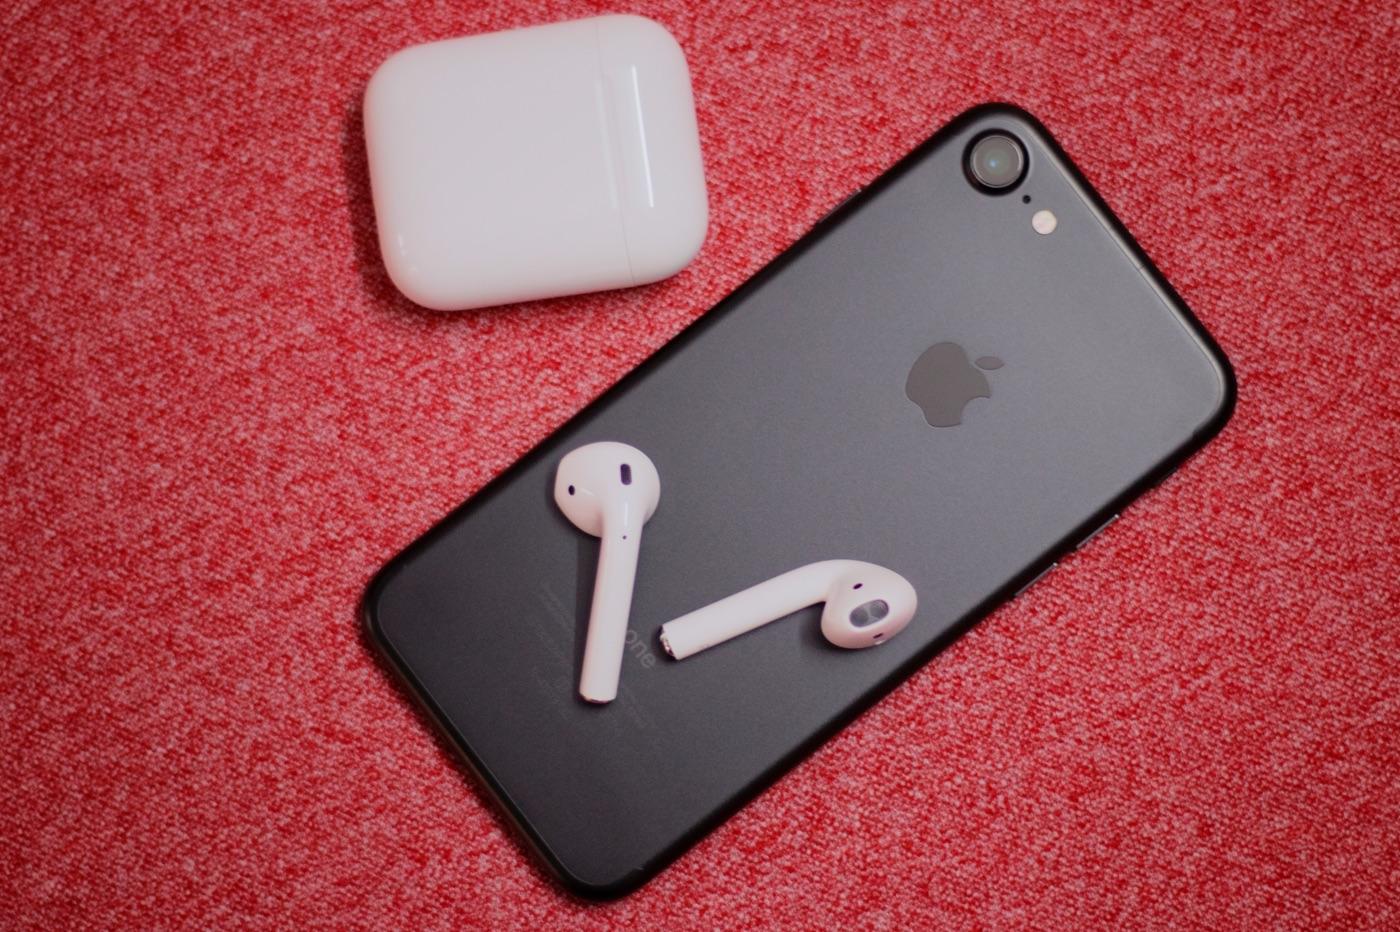 iPhone 7 et AirPods